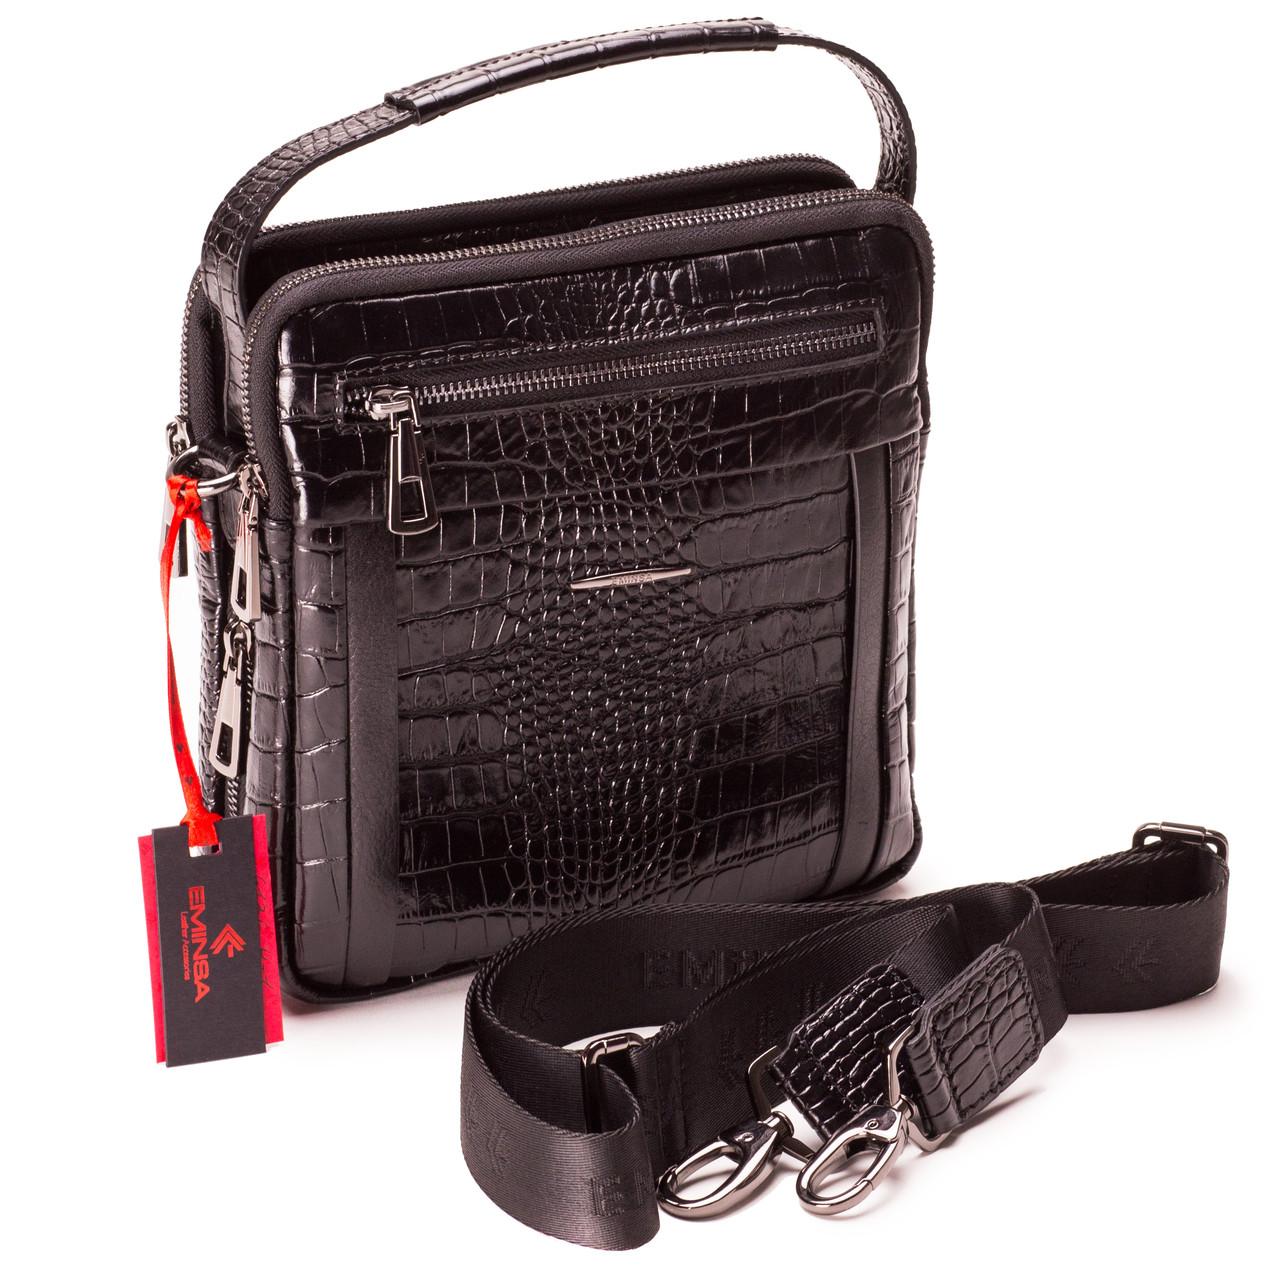 Мужская сумка кожаная черная Eminsa 6136-4-1